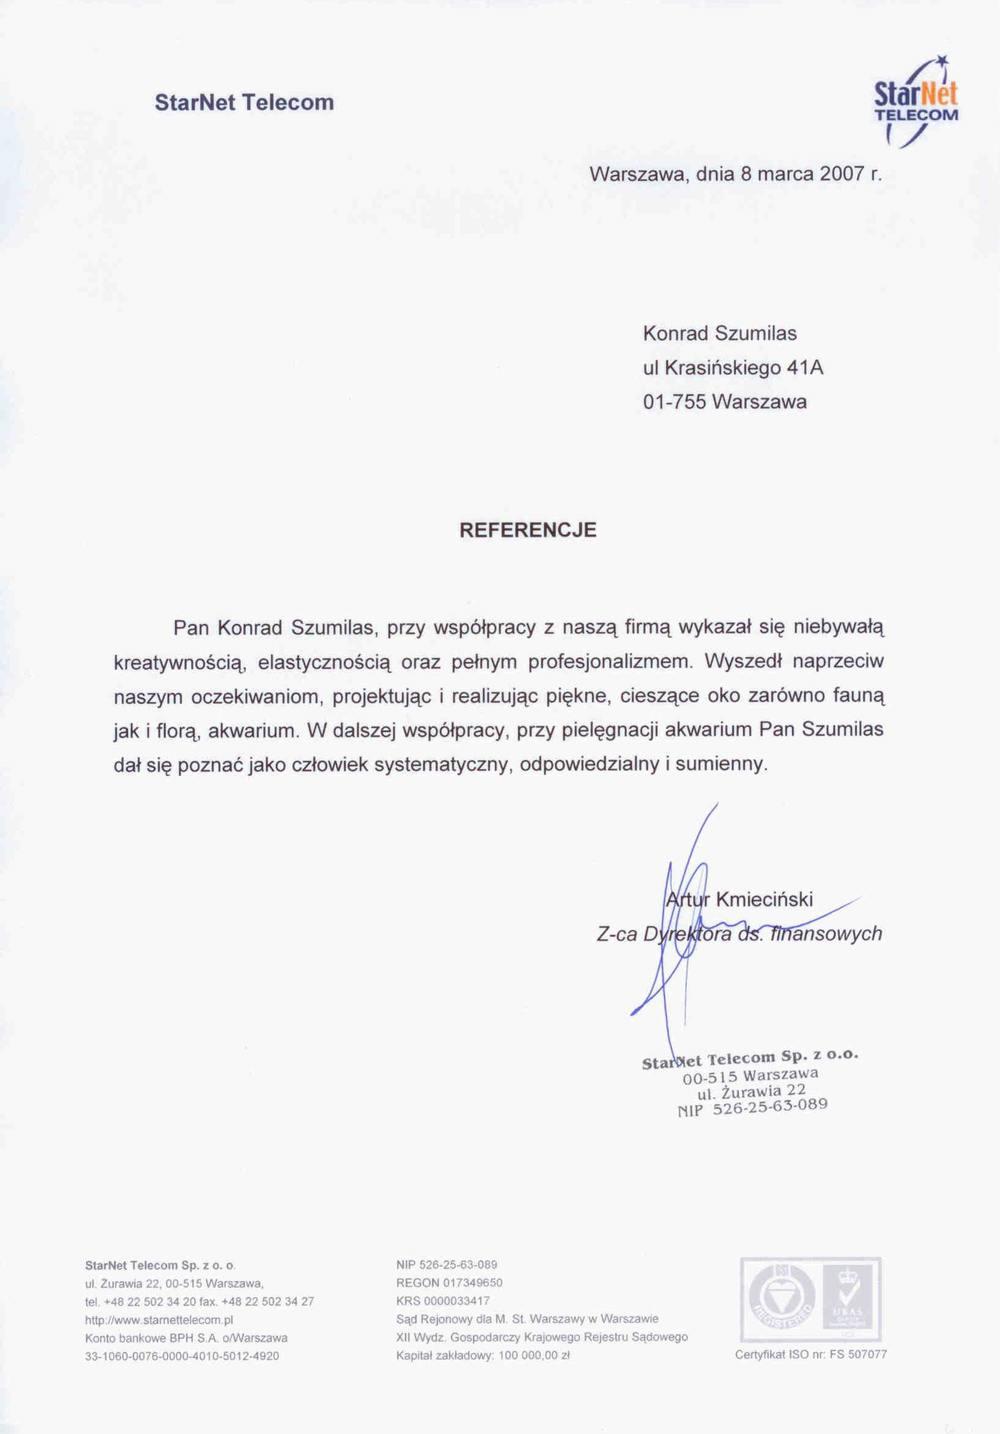 Referencje_Szumilas.jpg